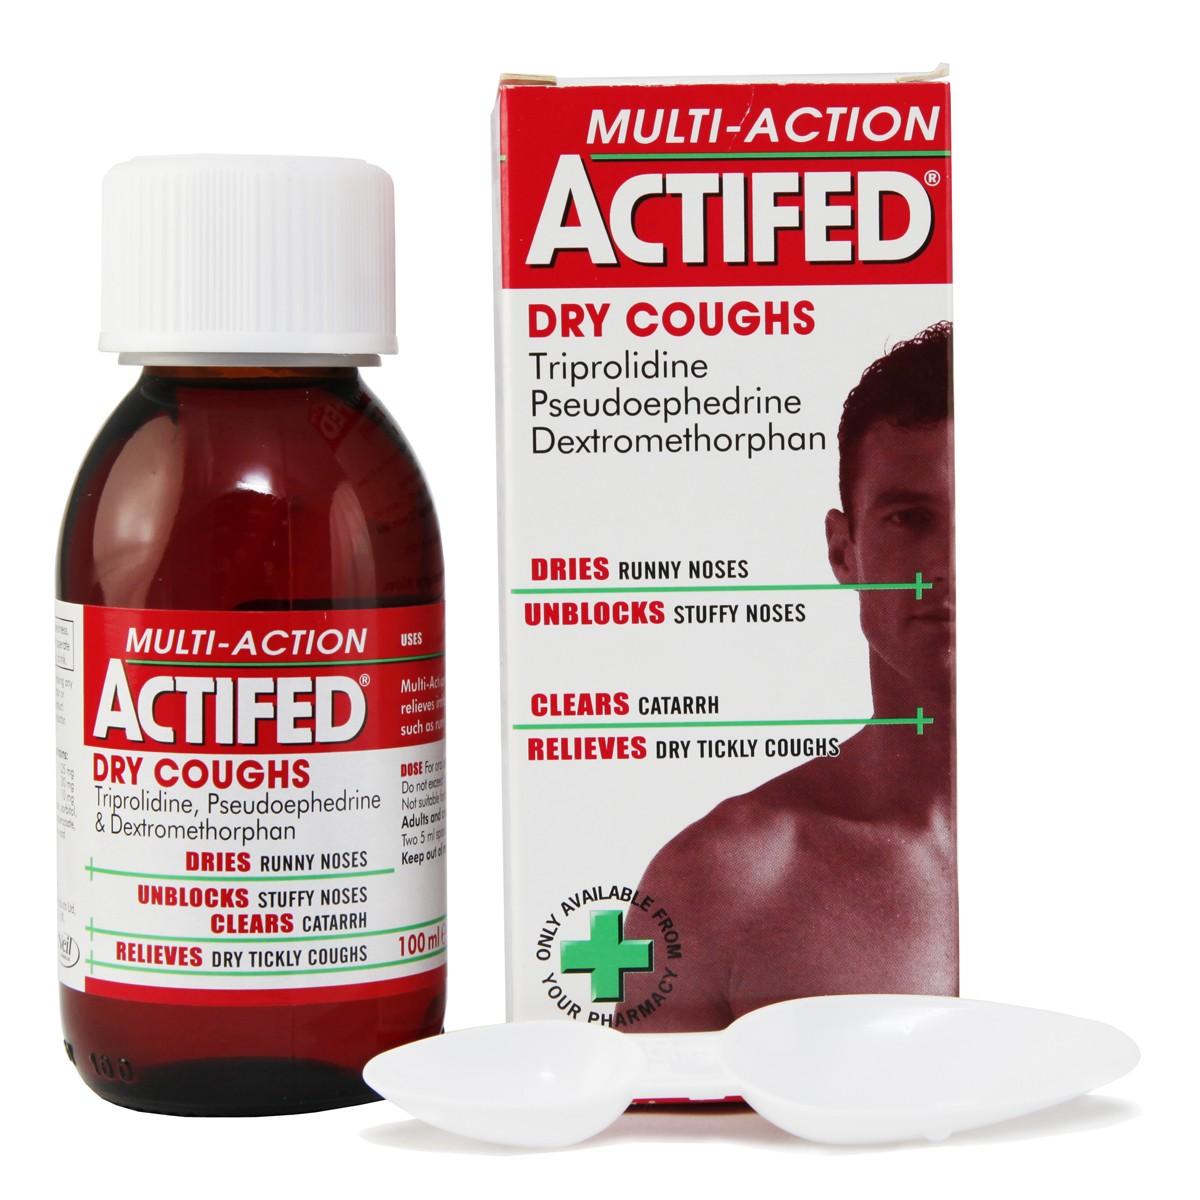 Actifed Multi-Action Dry Cough Liquid